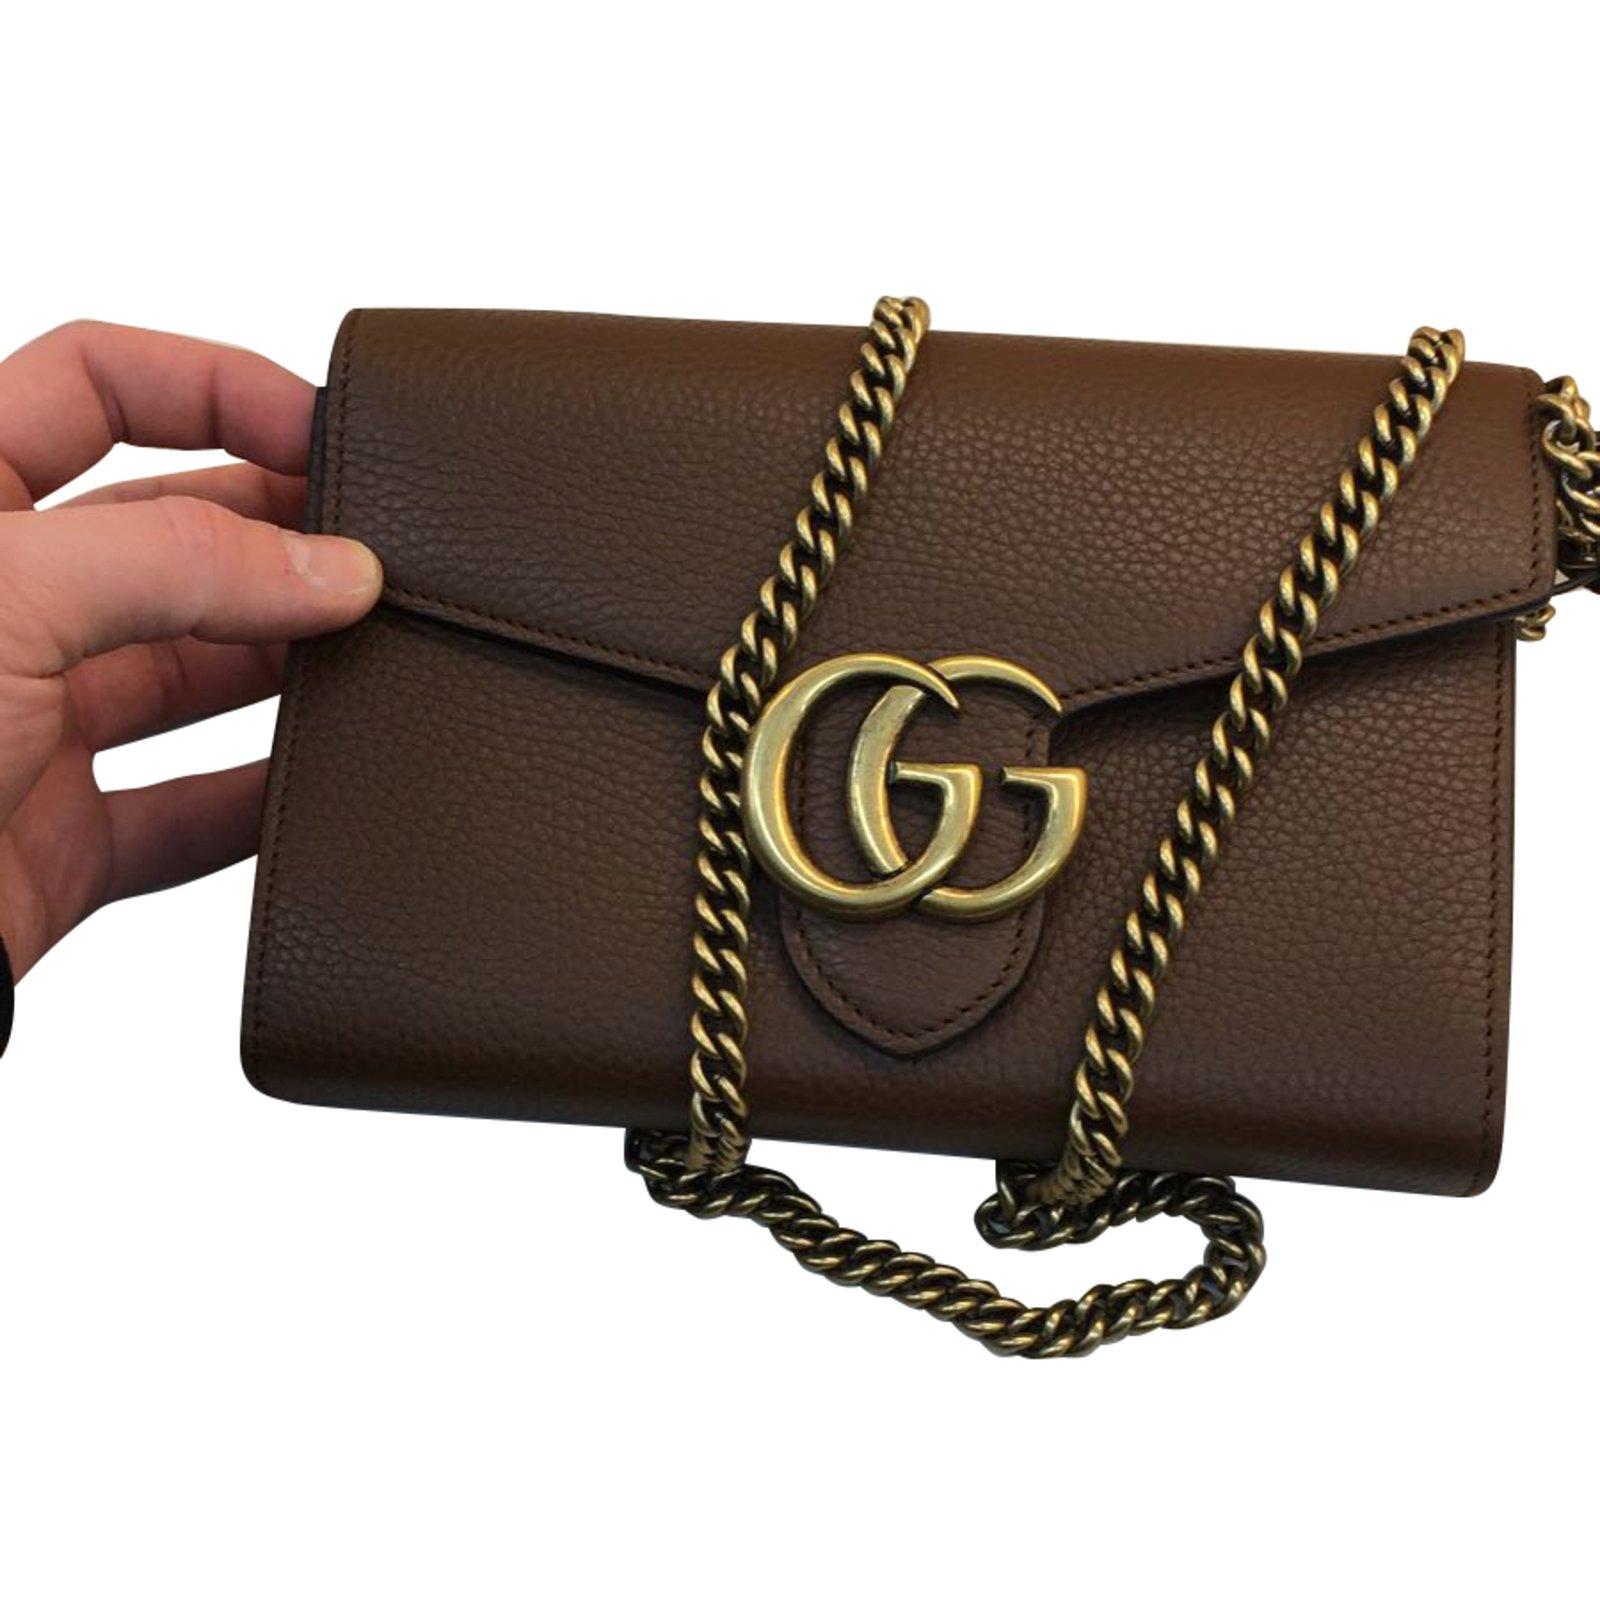 Gucci Marmont Bag Handbags Leather Brown Ref 66308 Joli Closet